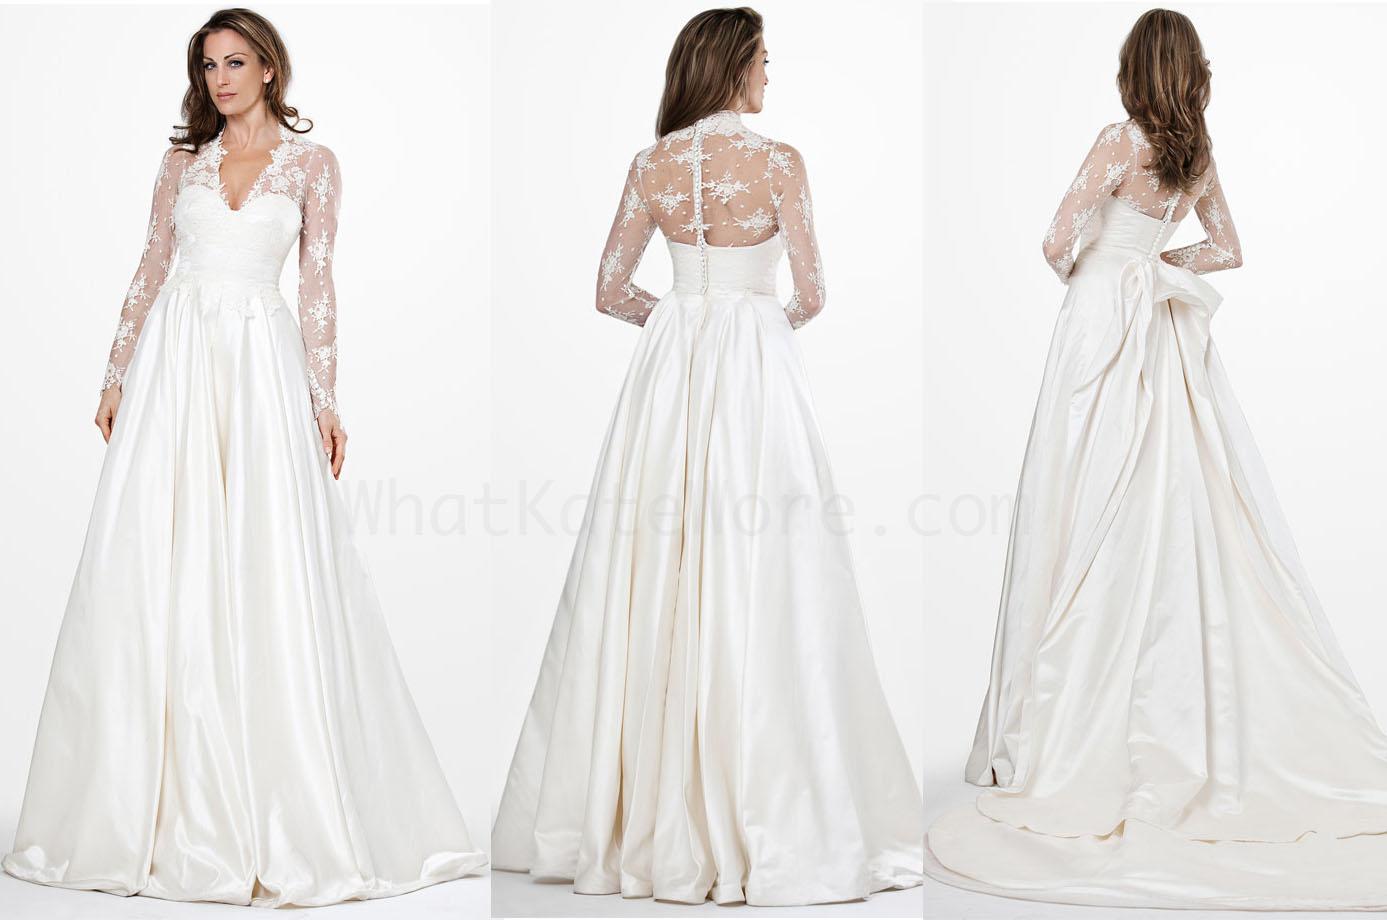 abs kate middleton gowns wedding dresses nordstrom JS Collection via Nordstrom